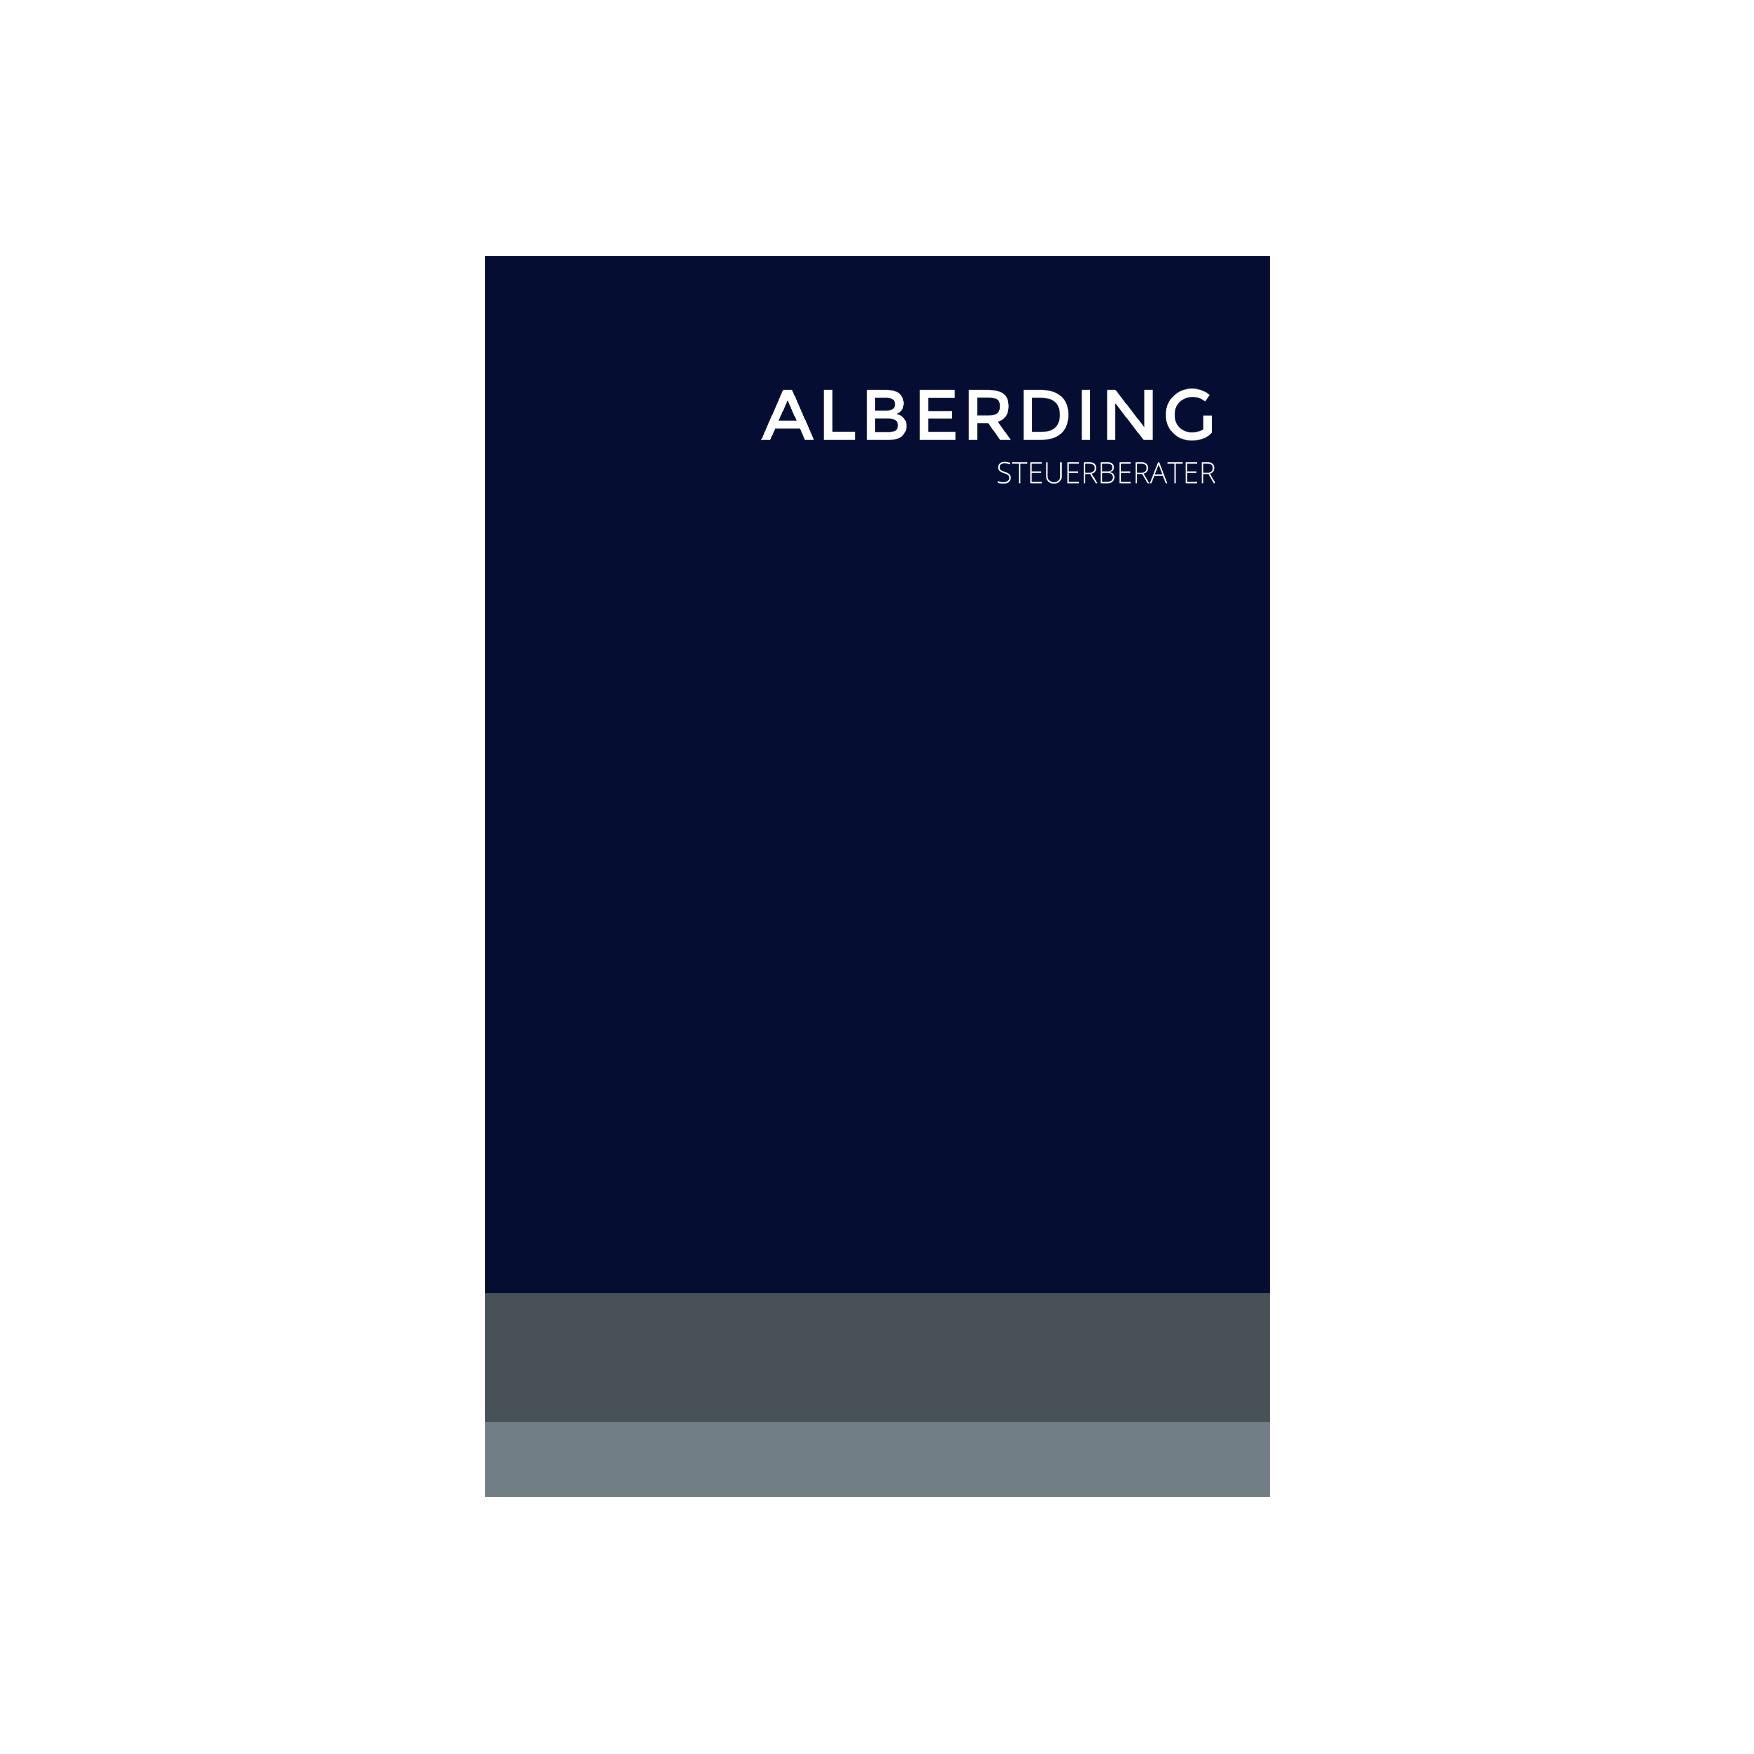 Visual_ALBERDING